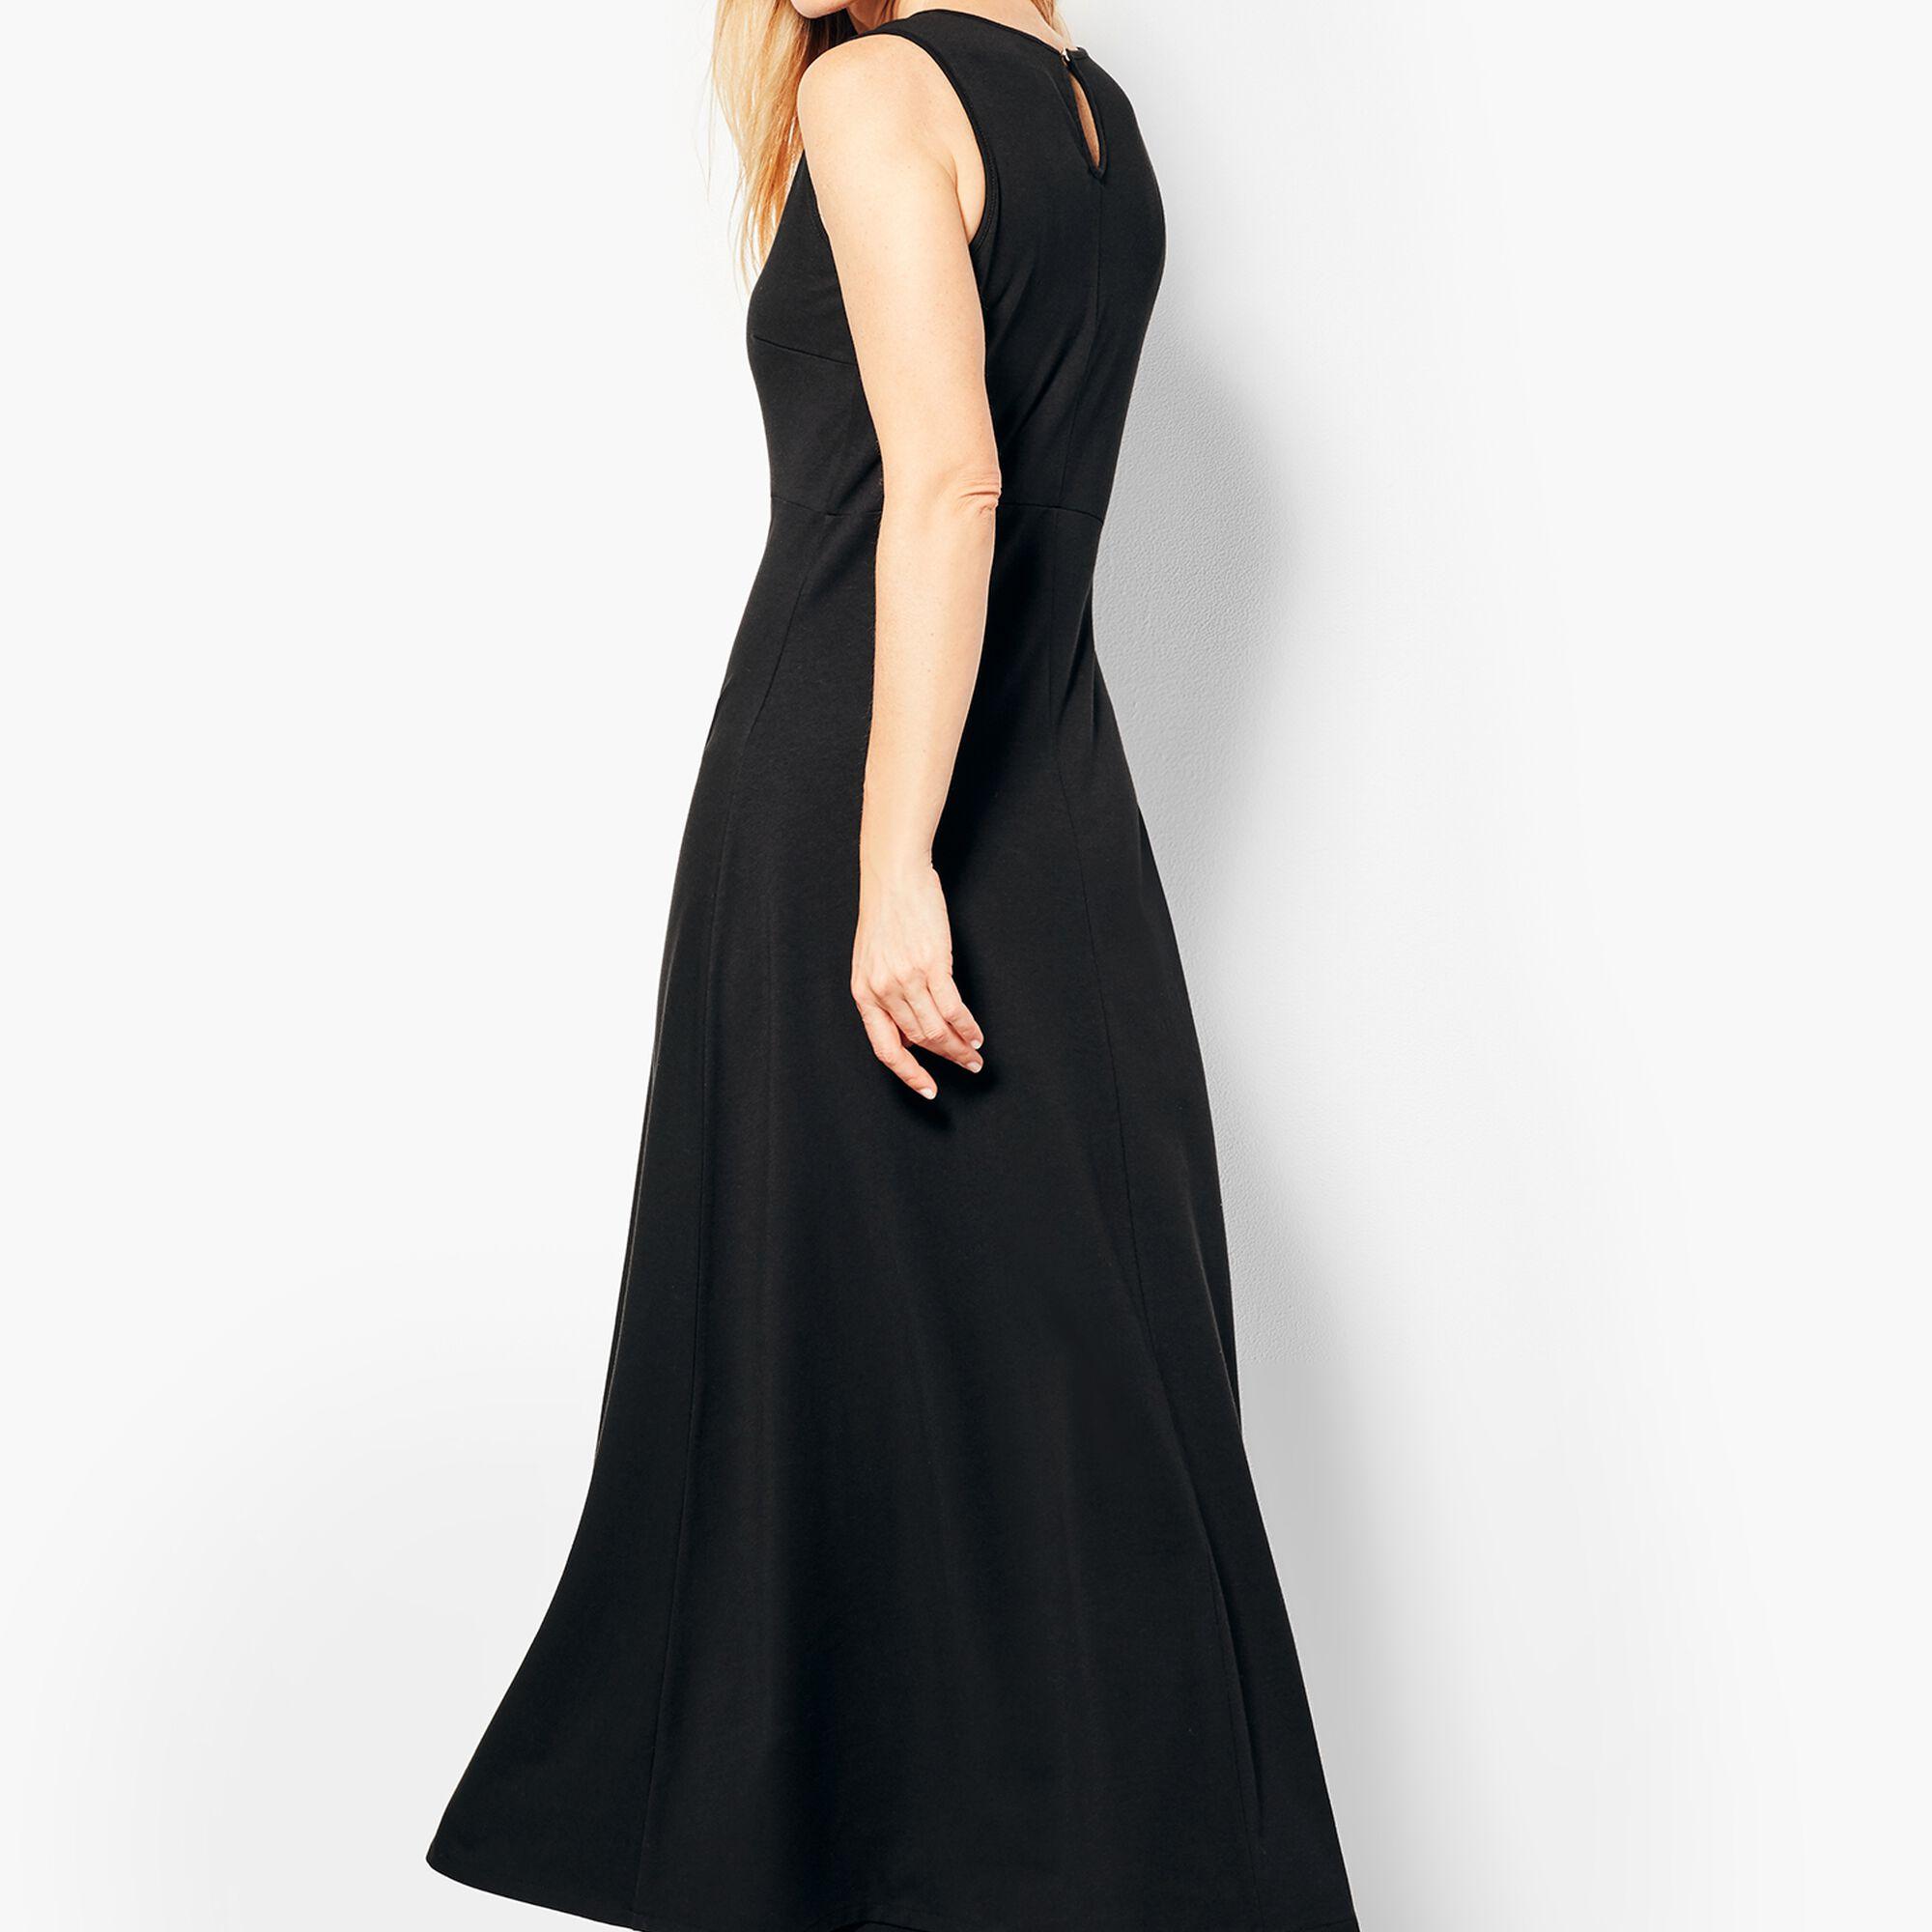 69a8fce3c10 Casual Jersey Maxi Dress